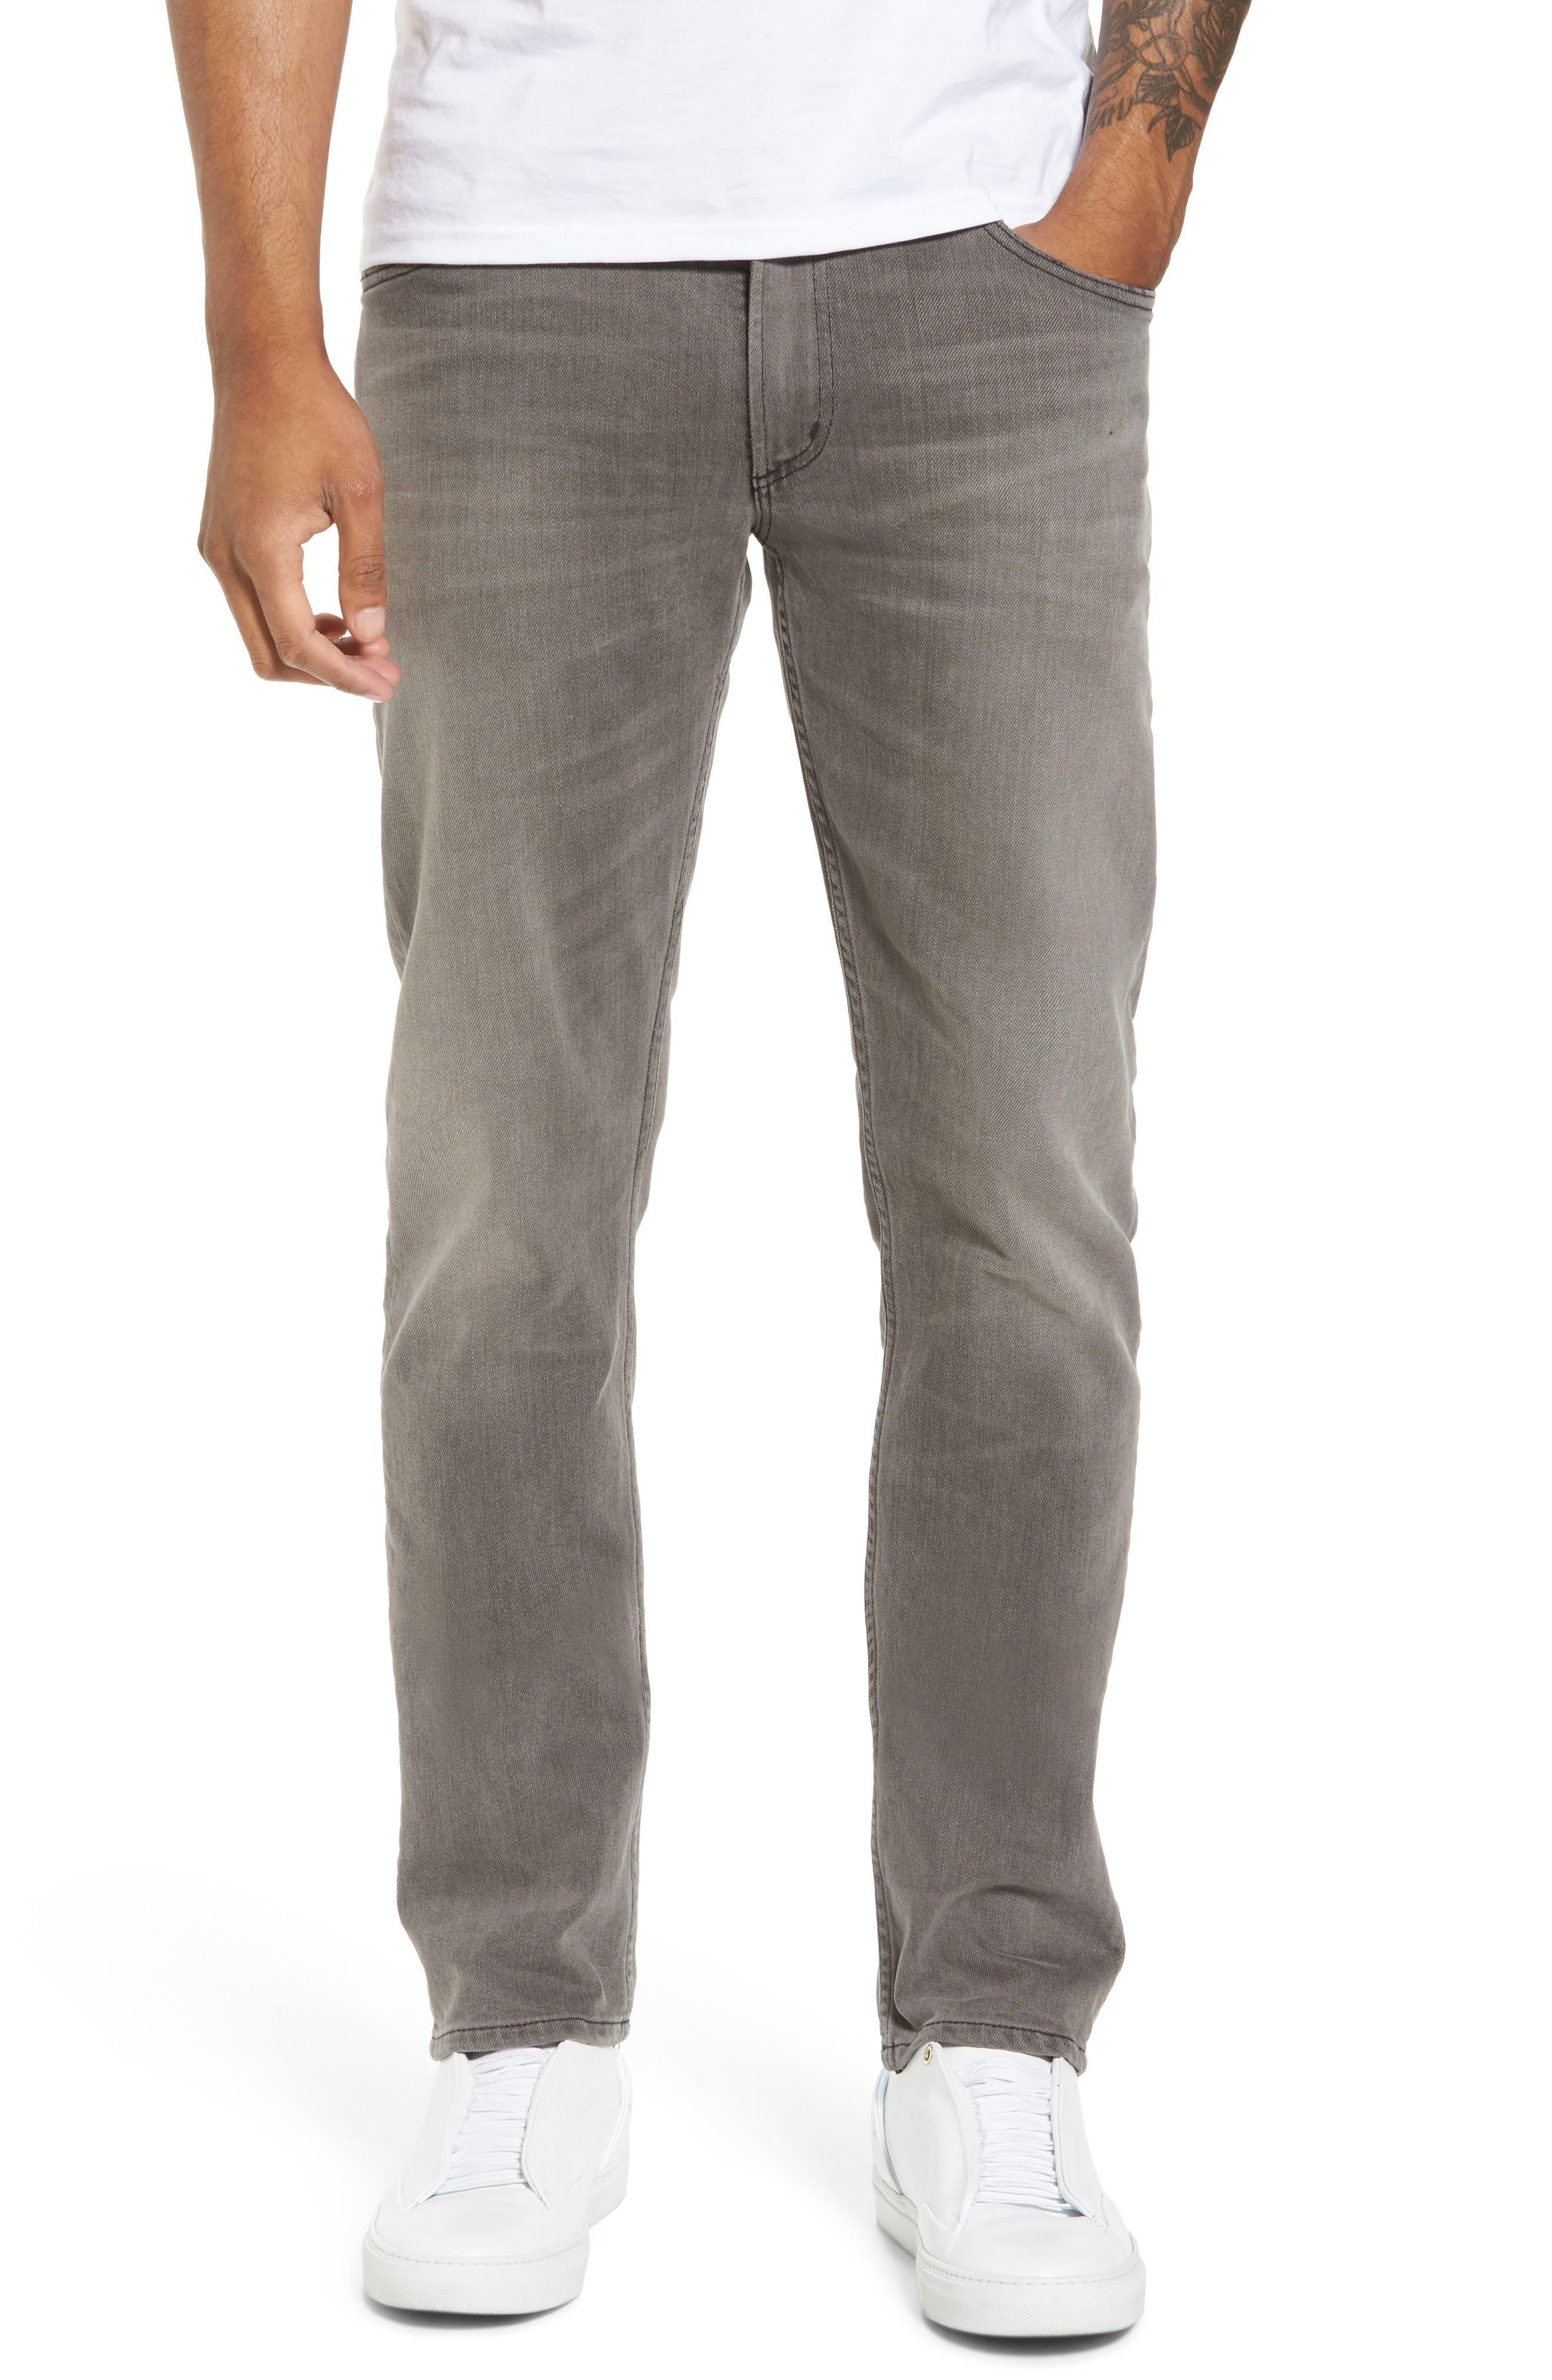 Bowery Slim Fit Jeans,                             Main thumbnail 1, color,                             Leon